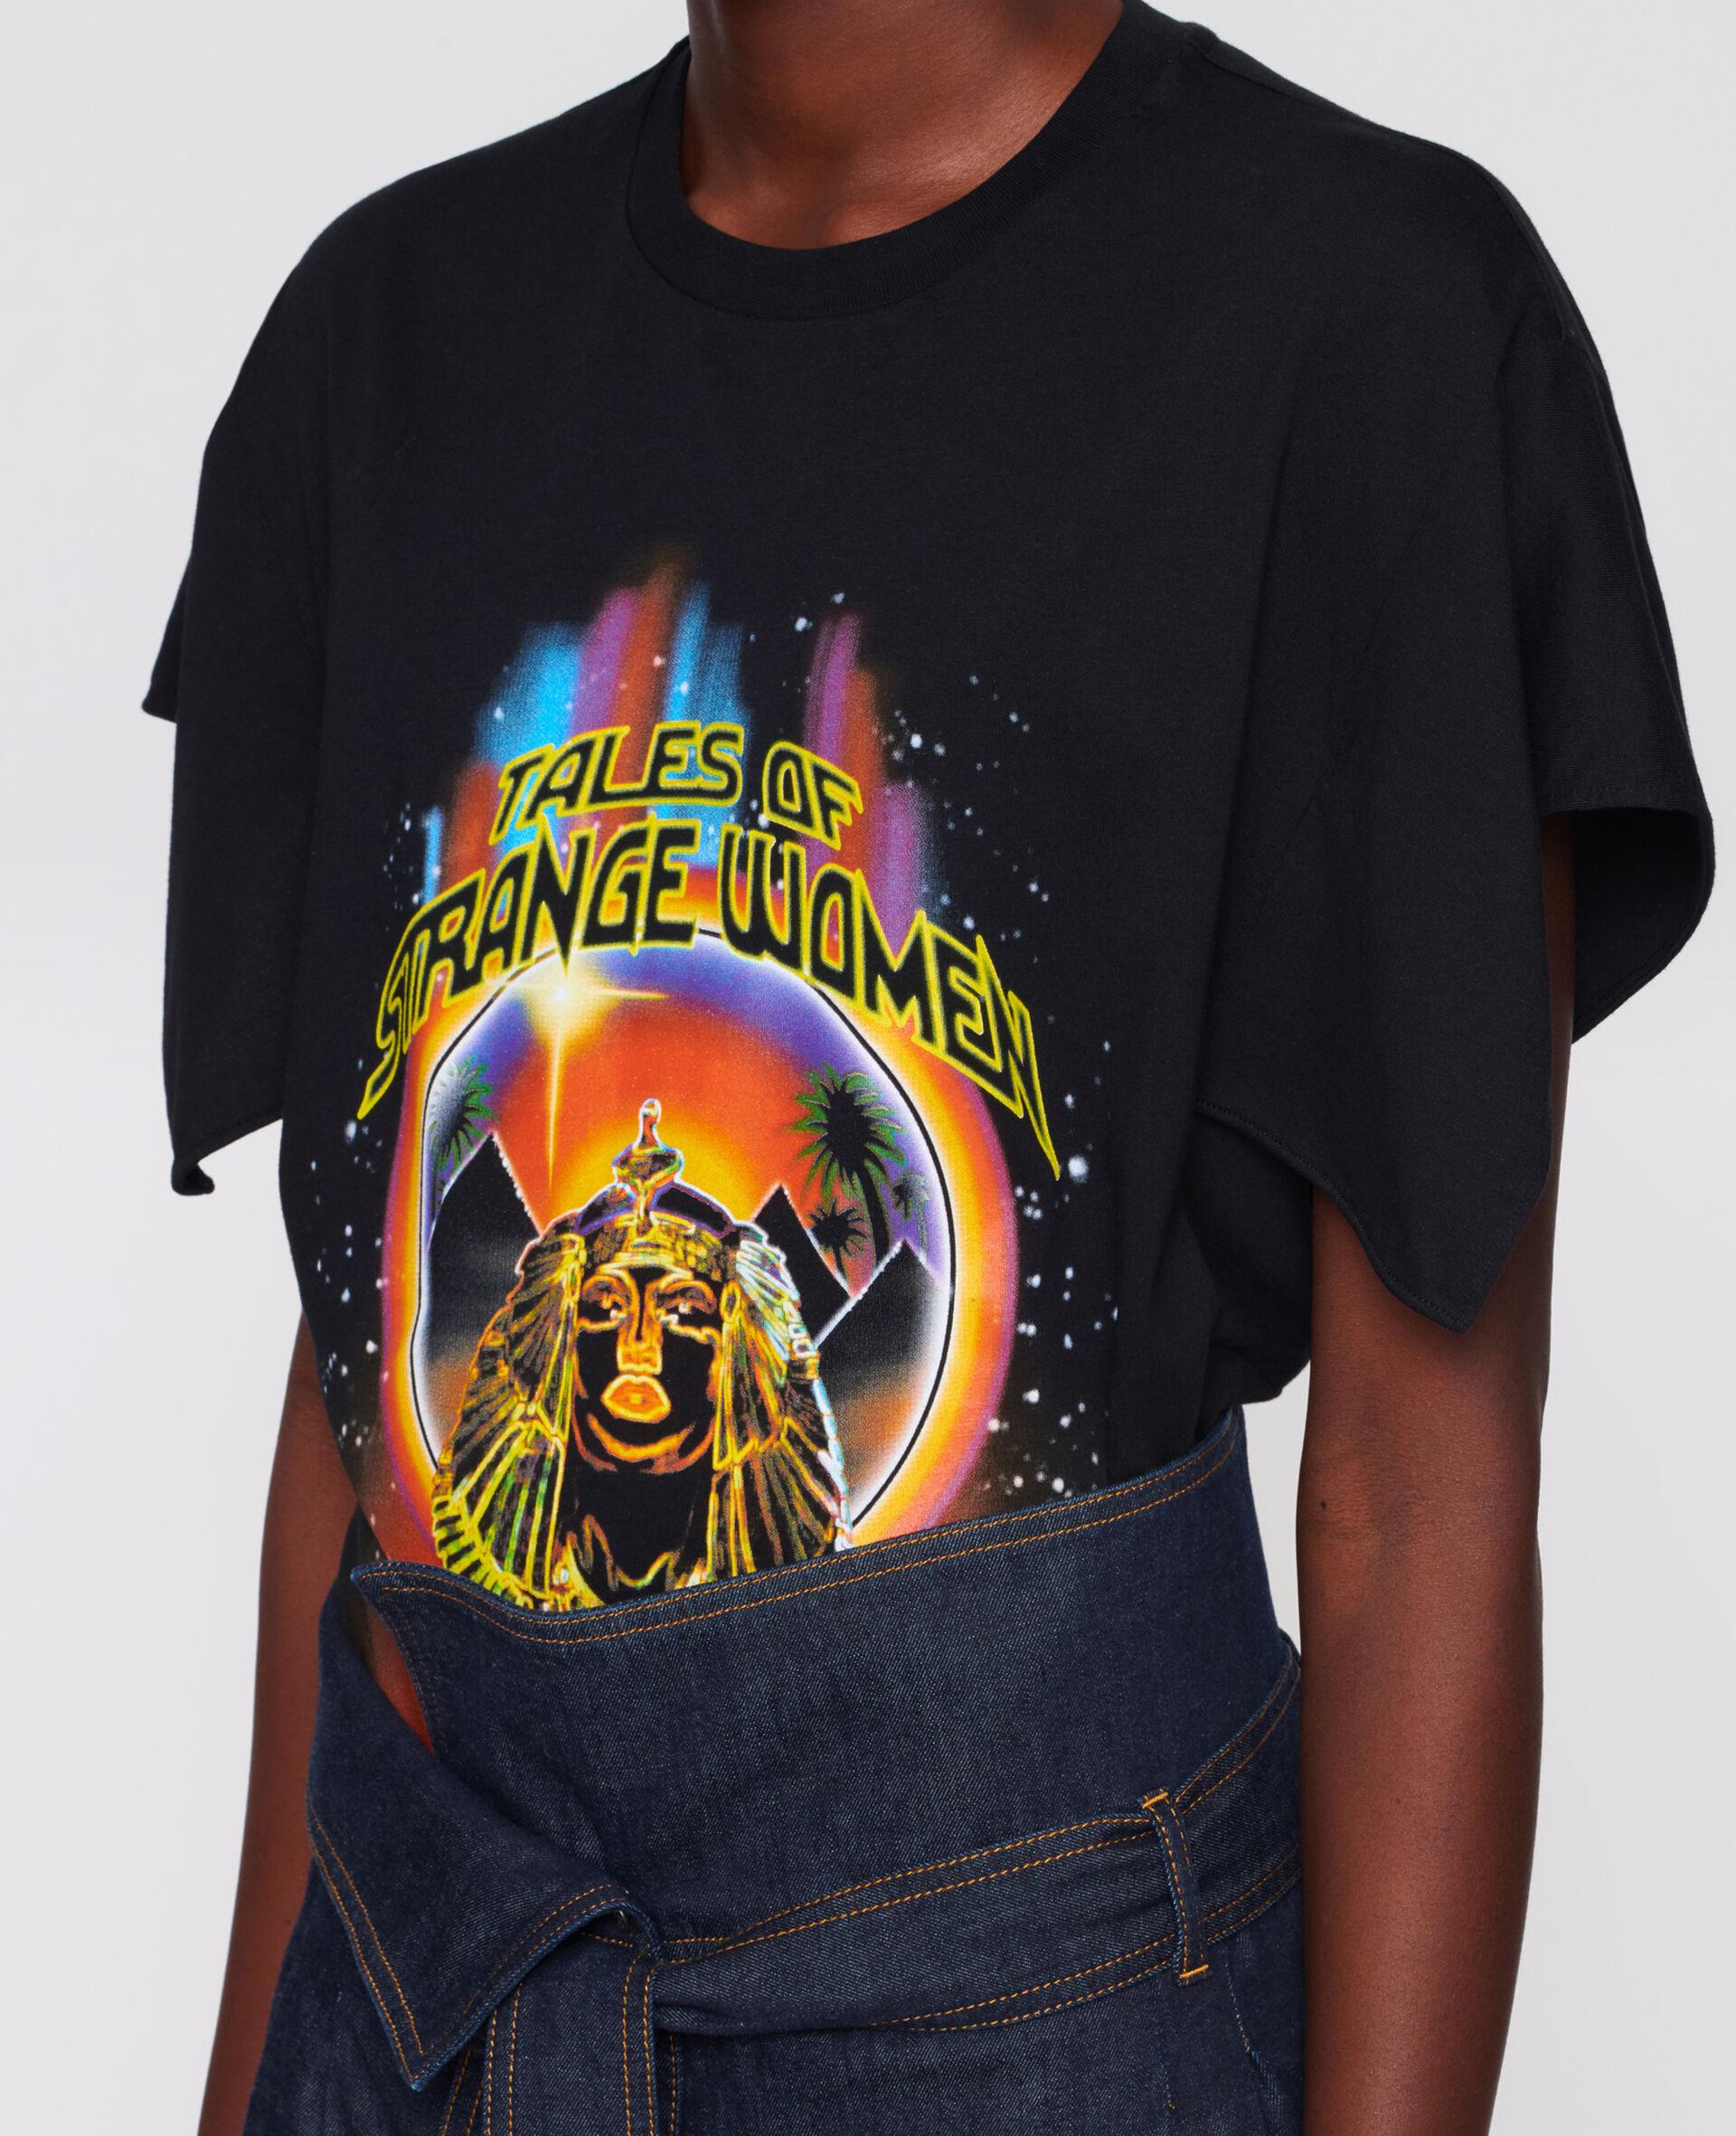 Tales of strange women T-shirt-Black-large image number 3